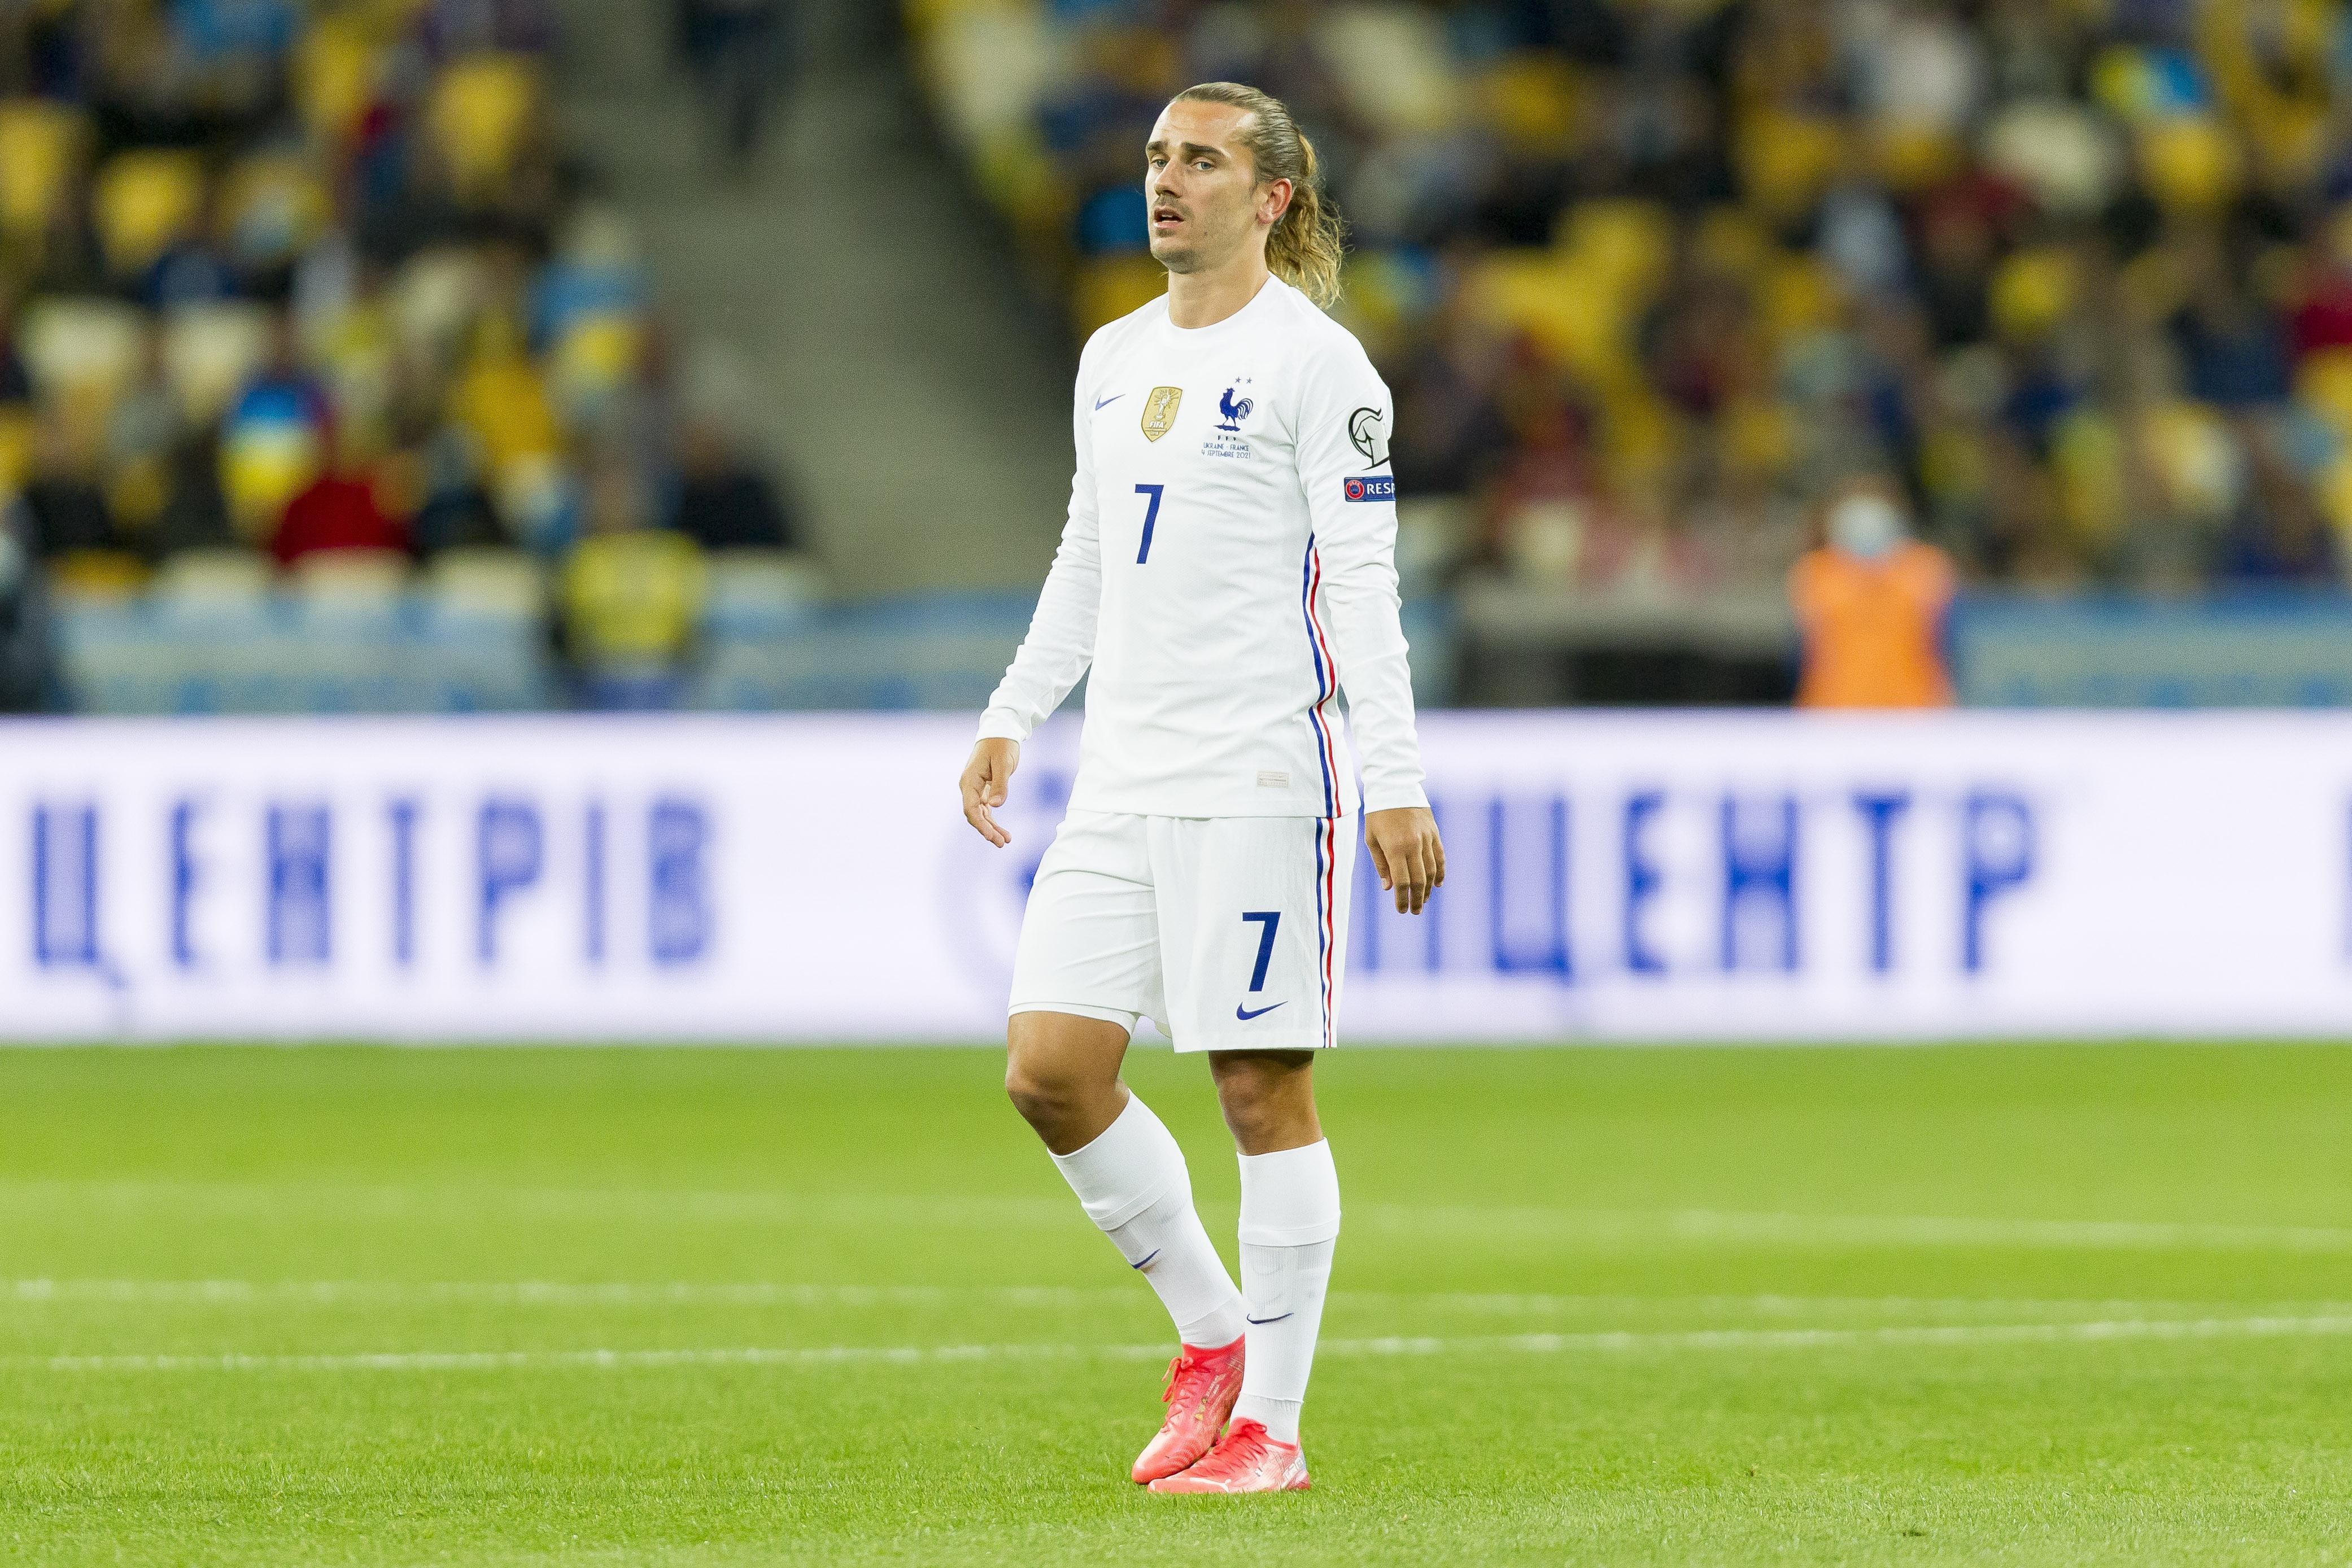 Ukraine v France - FIFA World Cup 2022 Qatar qualification